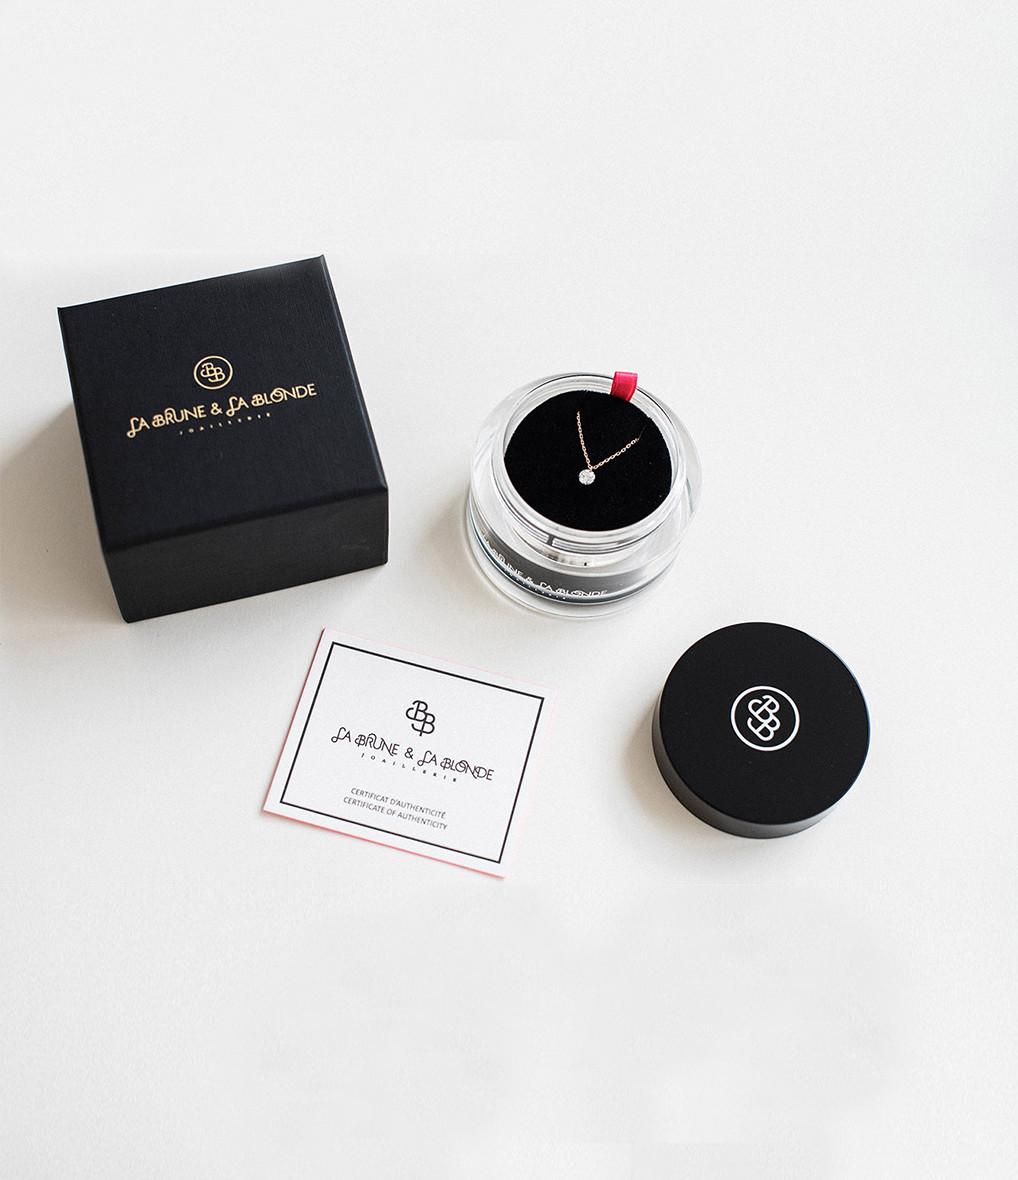 LA BRUNE & LA BLONDE - Bracelet Confetti 5 Rubis Saphirs Rose Or Rose